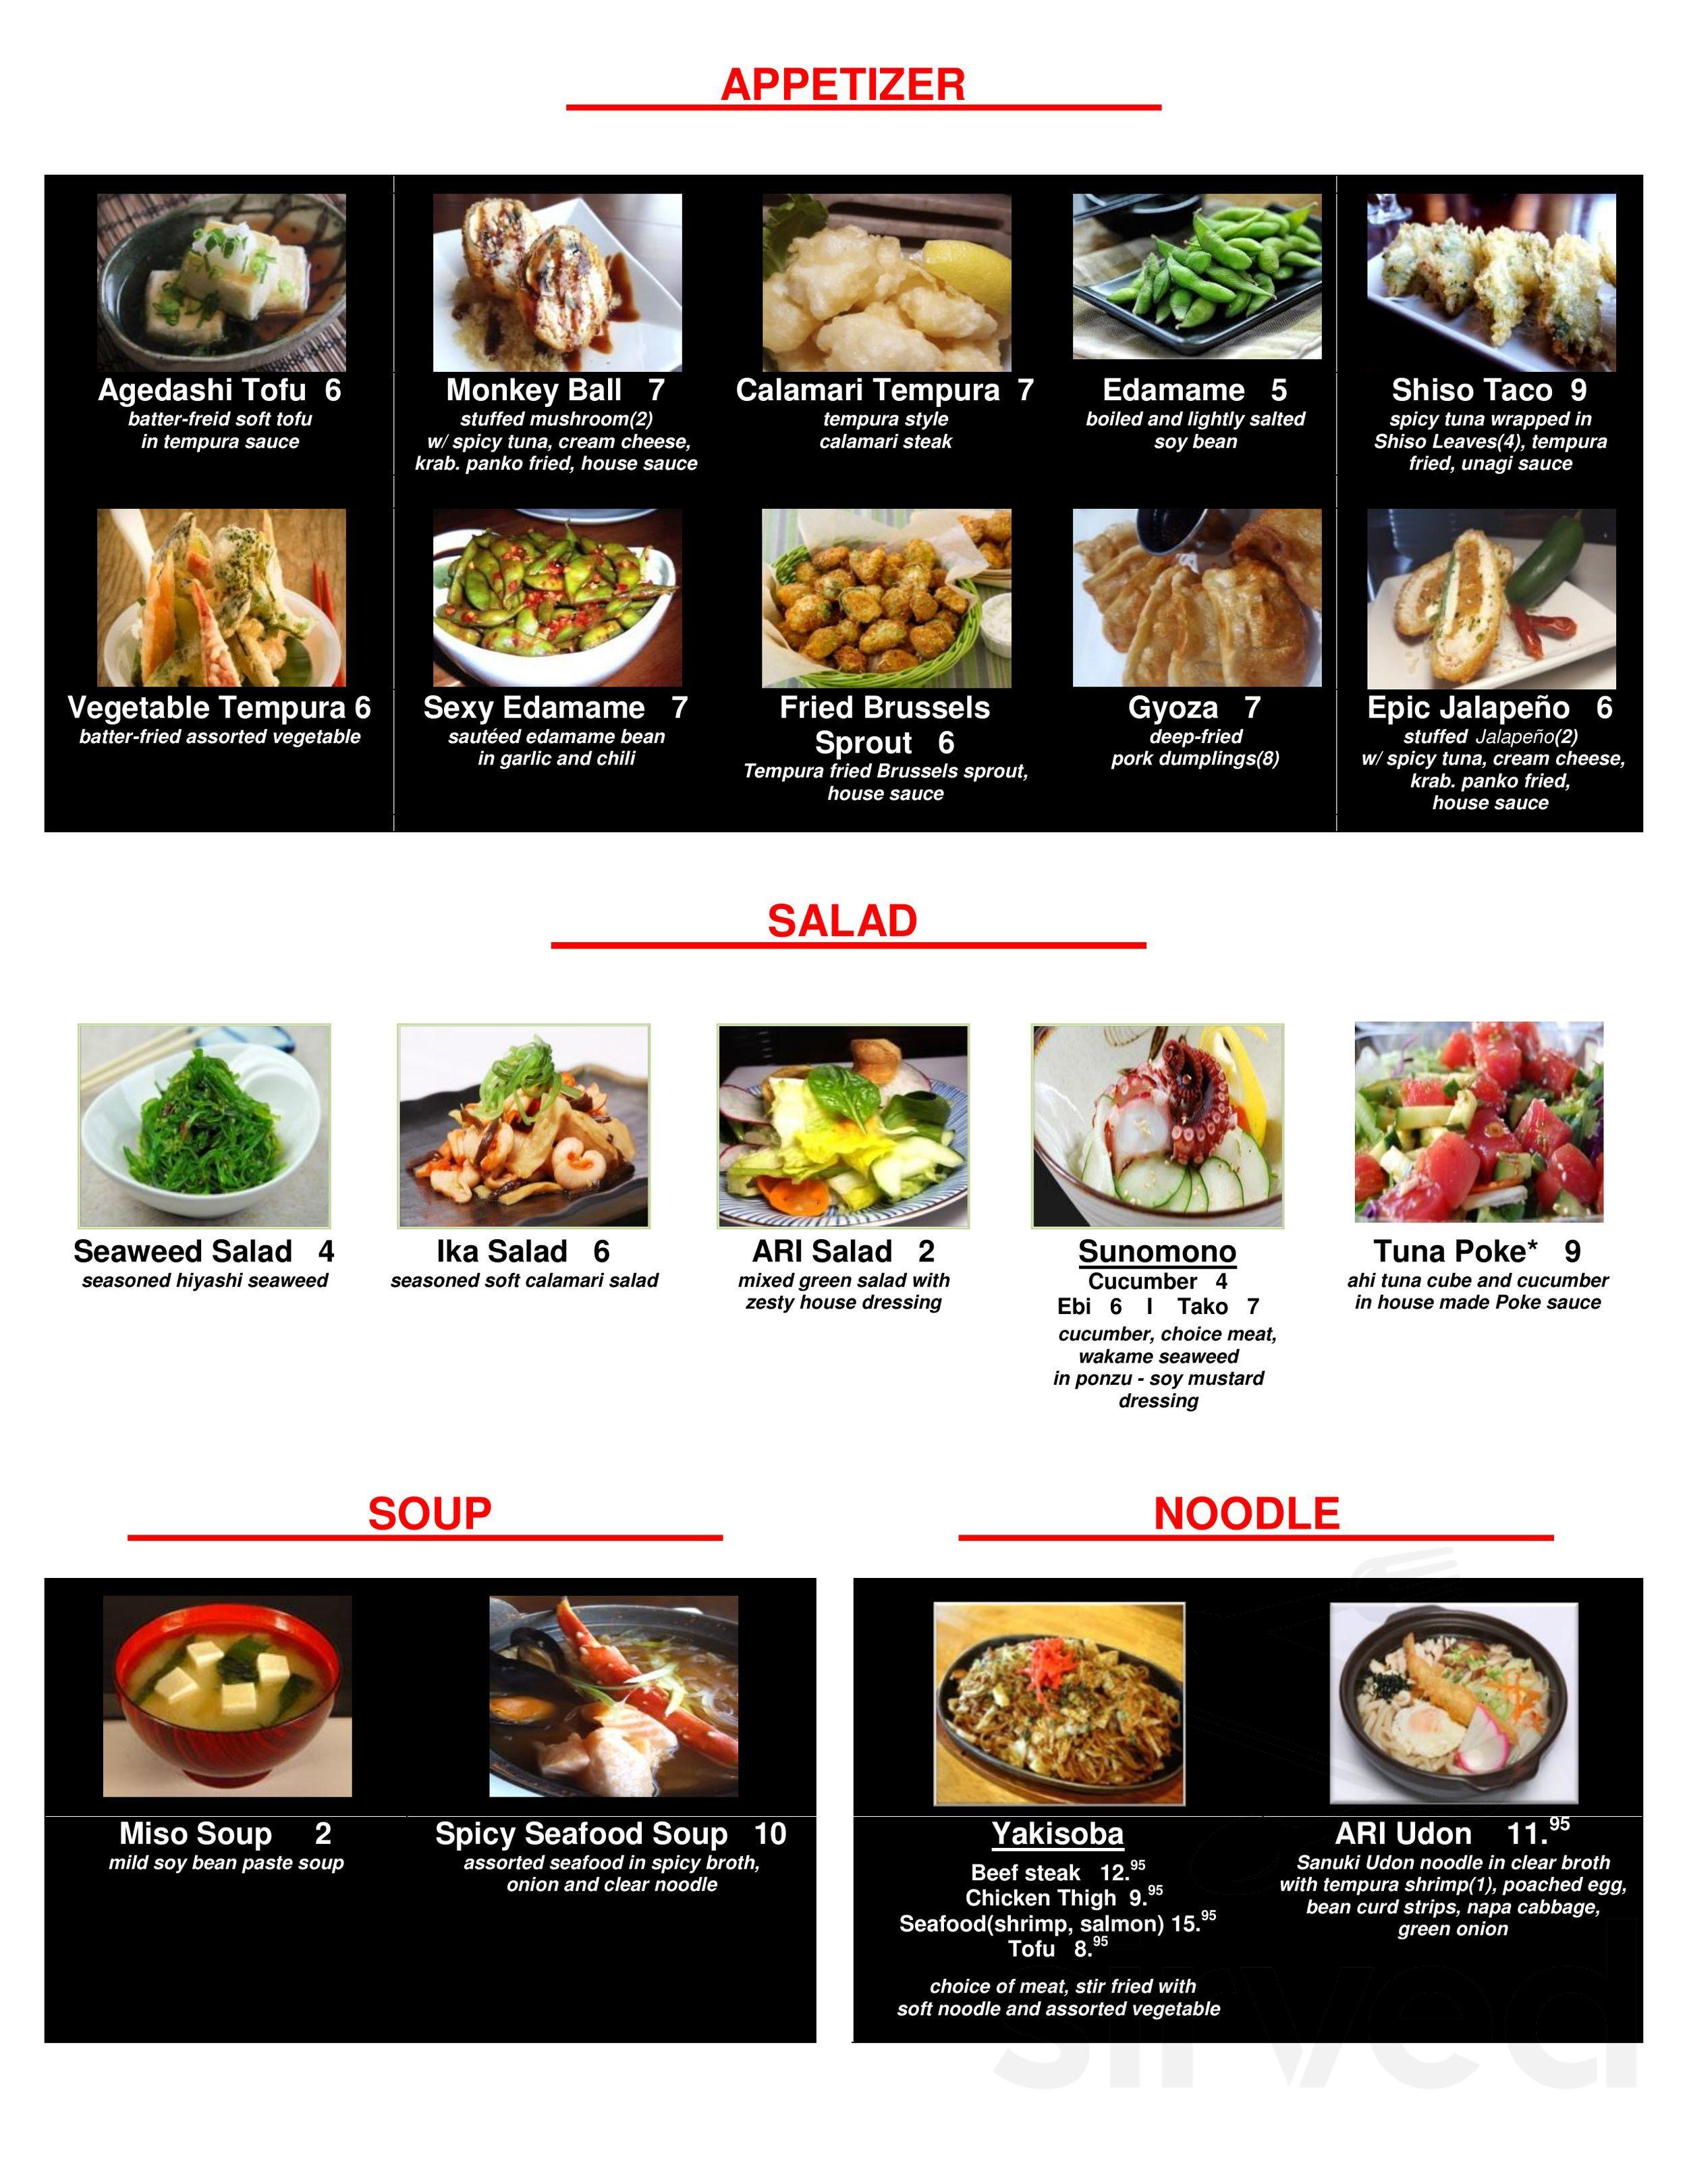 Menu For Sushi Ari Japanese Restaurant In Puyallup Washington